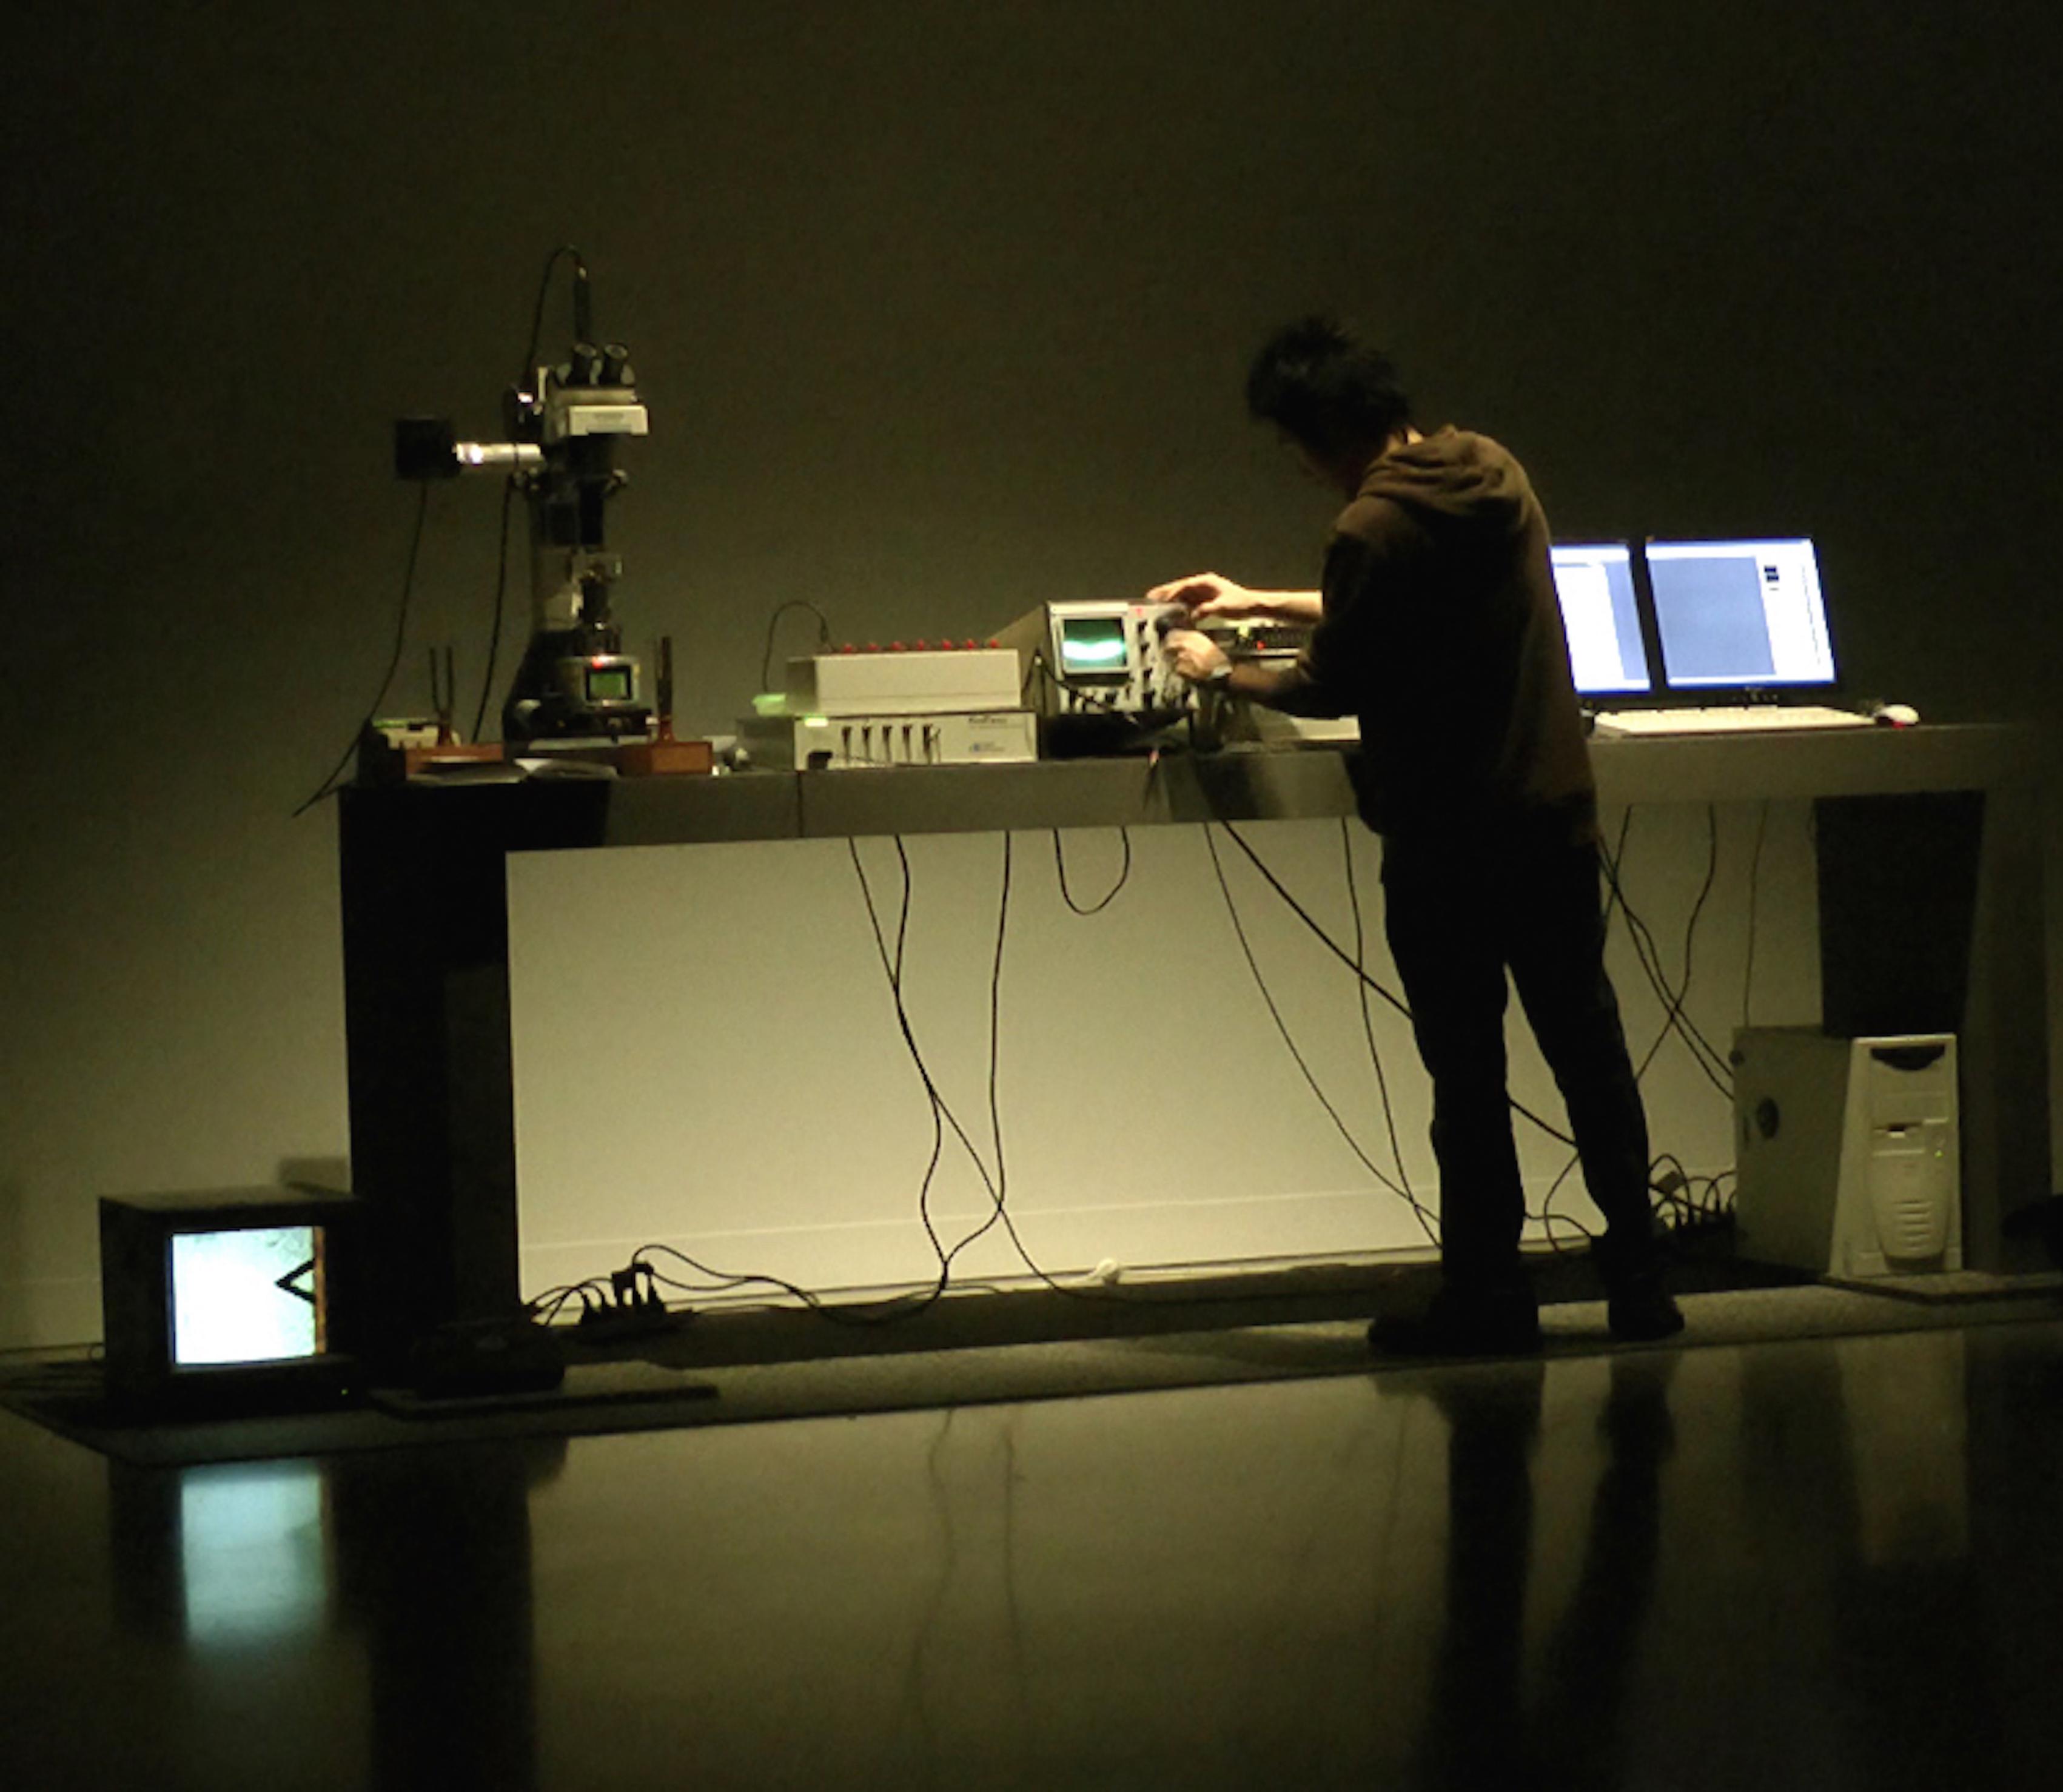 Image from Nanovibracy (2011) by Joel Ong.